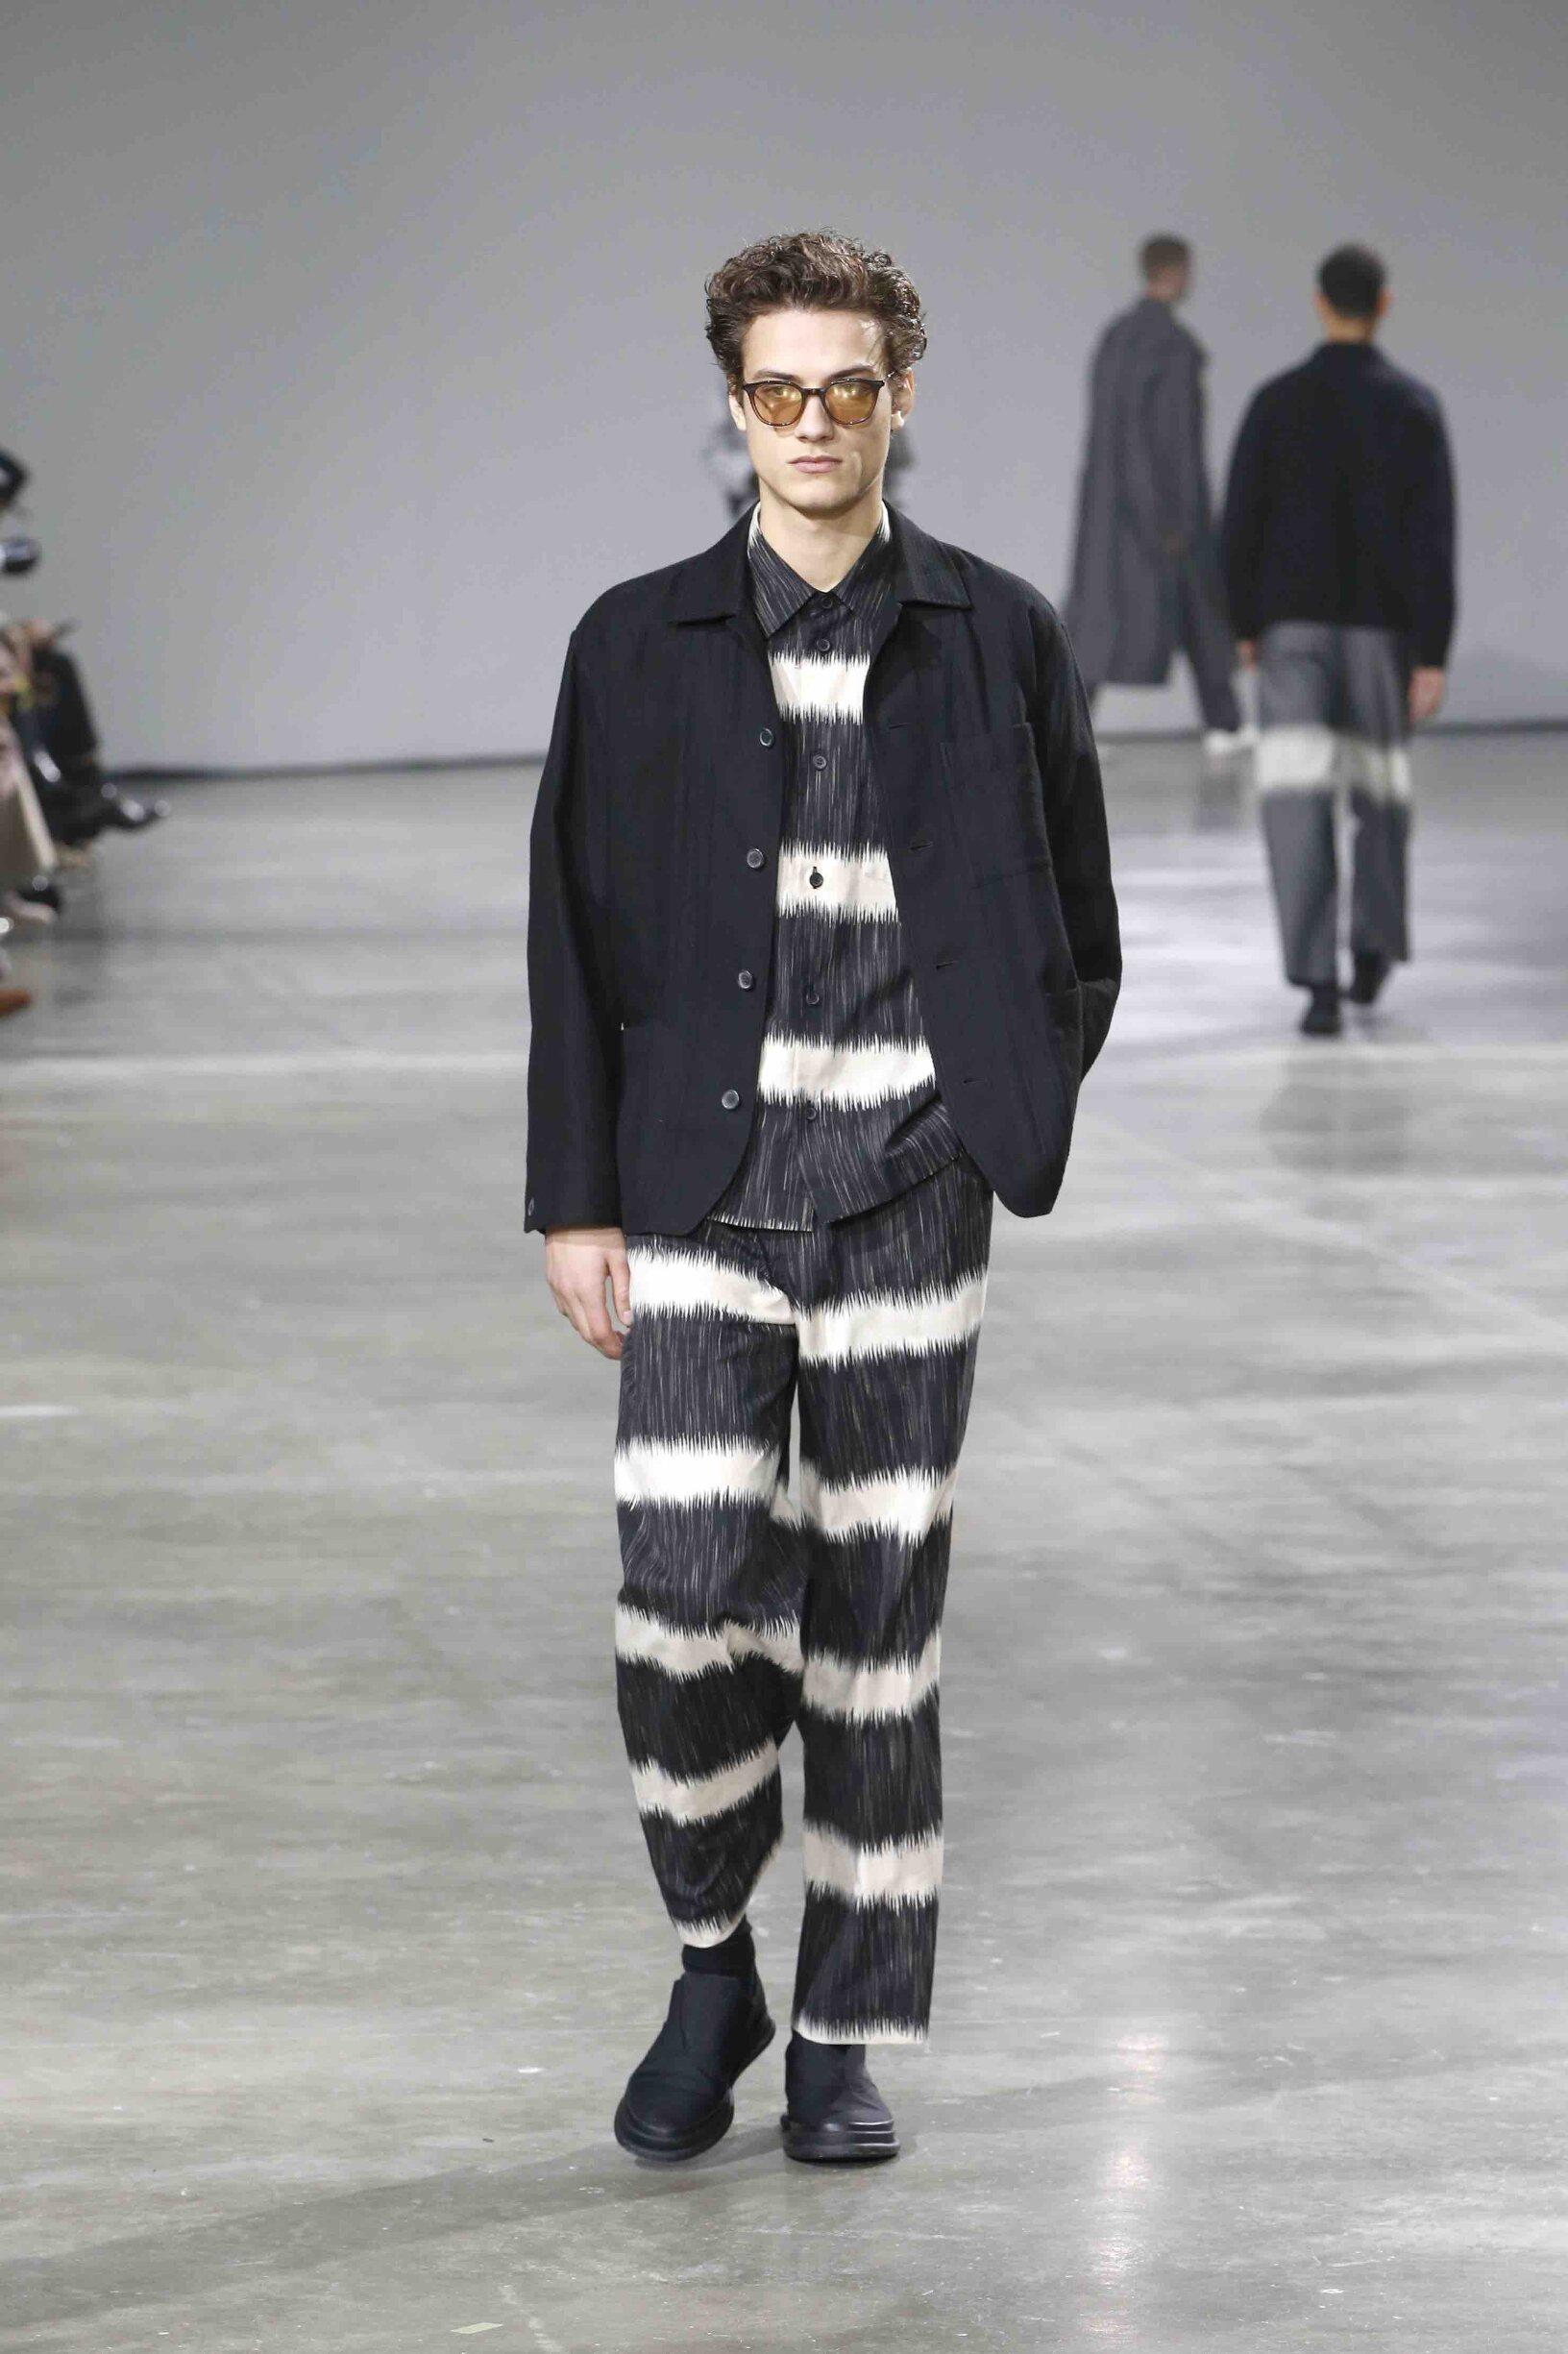 Fashion Show Man Model Issey Miyake Catwalk